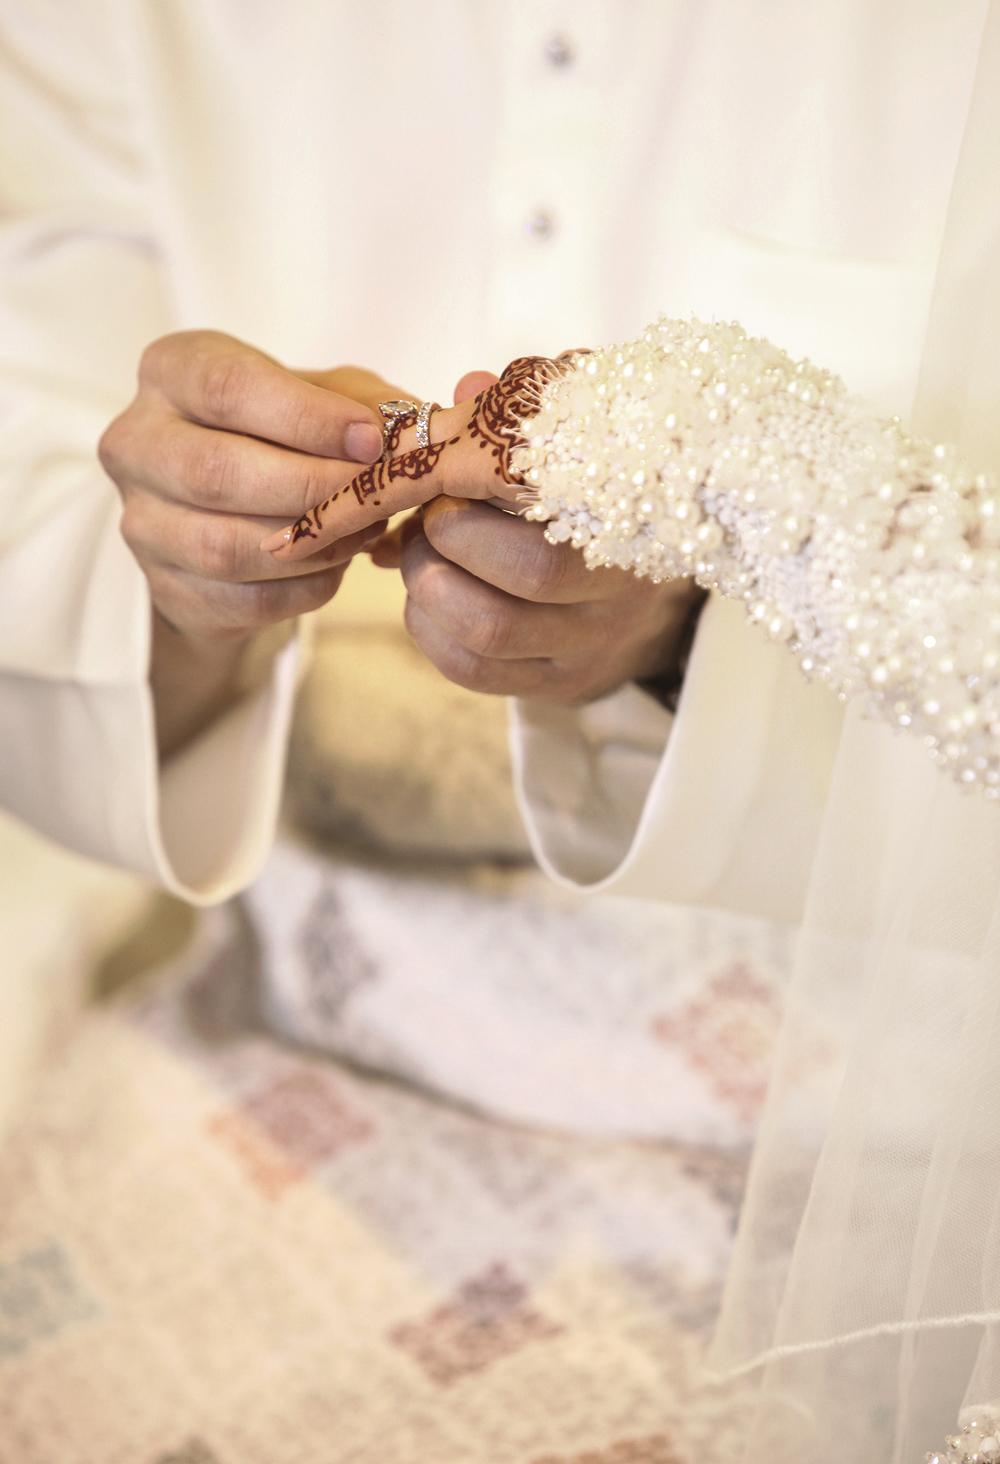 malaysia traditional malay wedding . the akad nikah of putera bruno araujo + puteri elfarezza . photography by kurt ahs ( perhapslifemoments ) . 7200.jpg